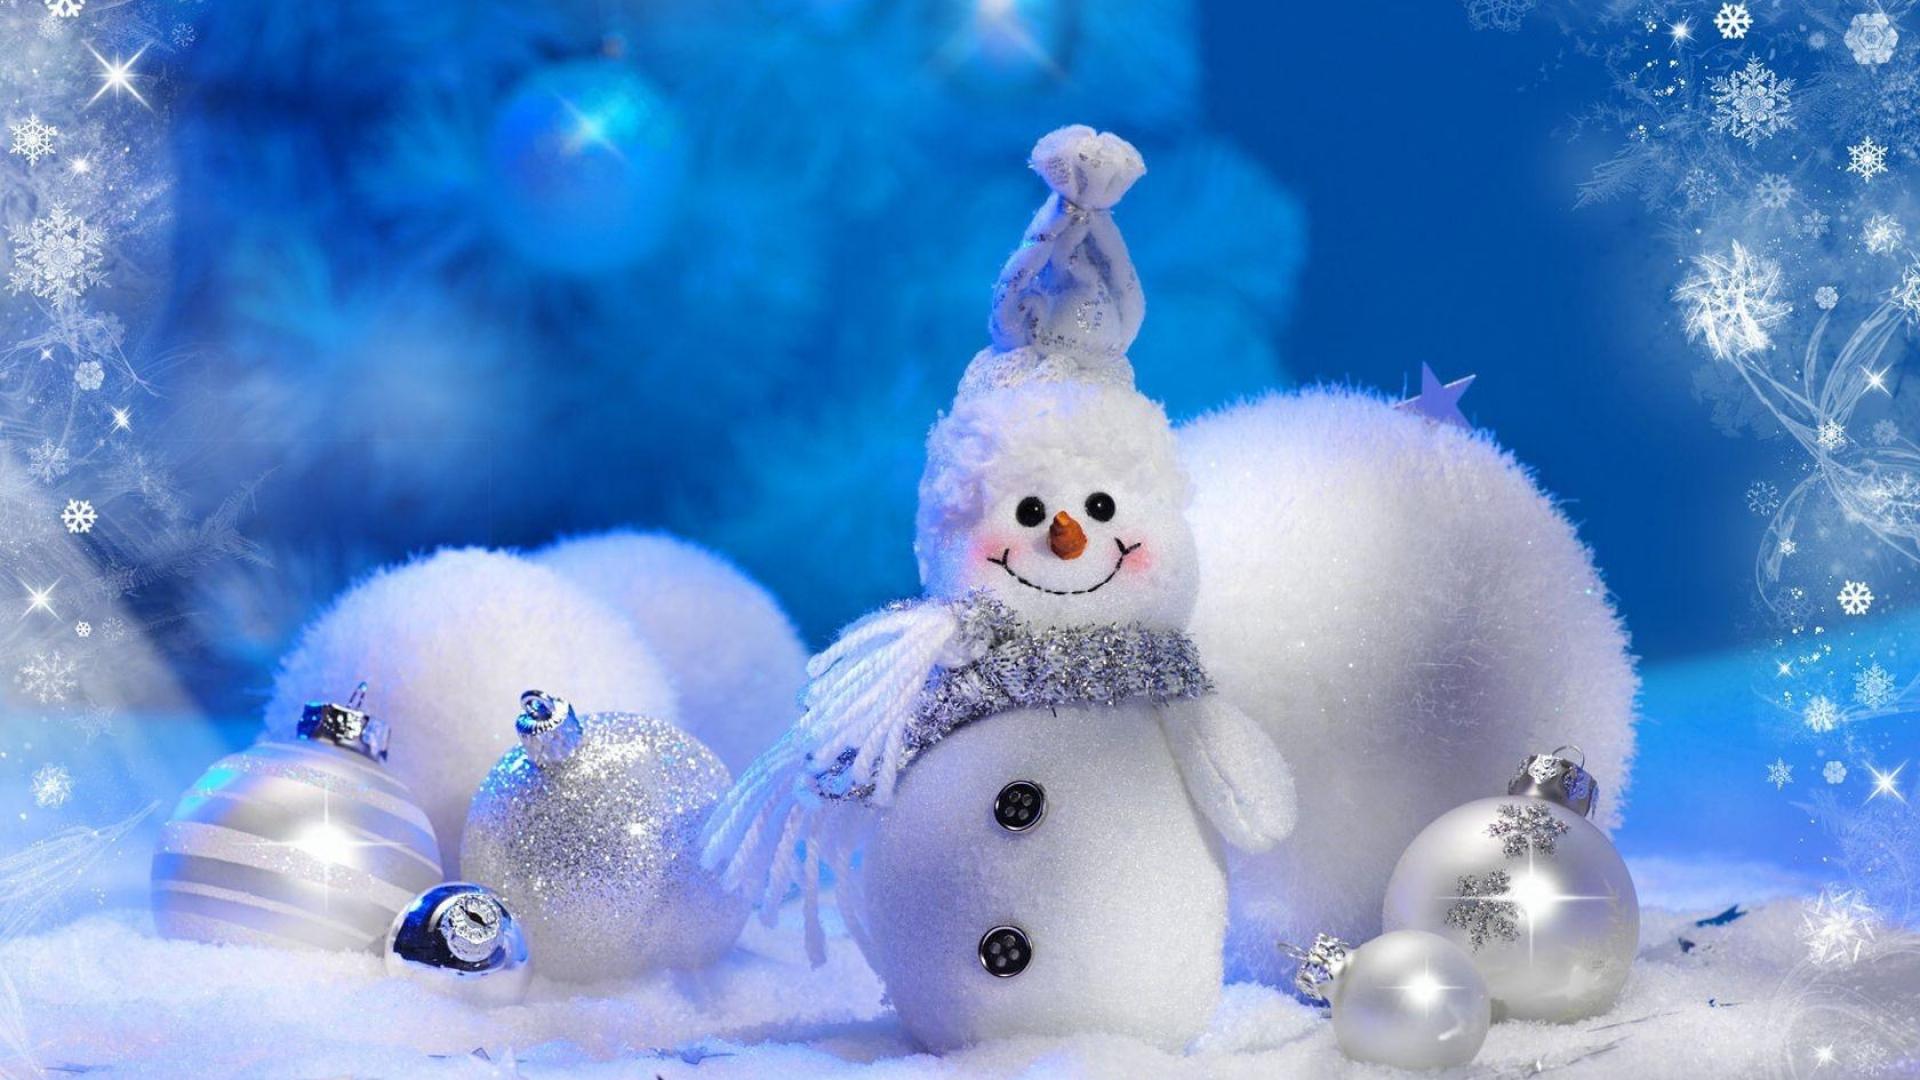 Download Wallpaper 1920x1080 snowman, christmas decorations, smile ...